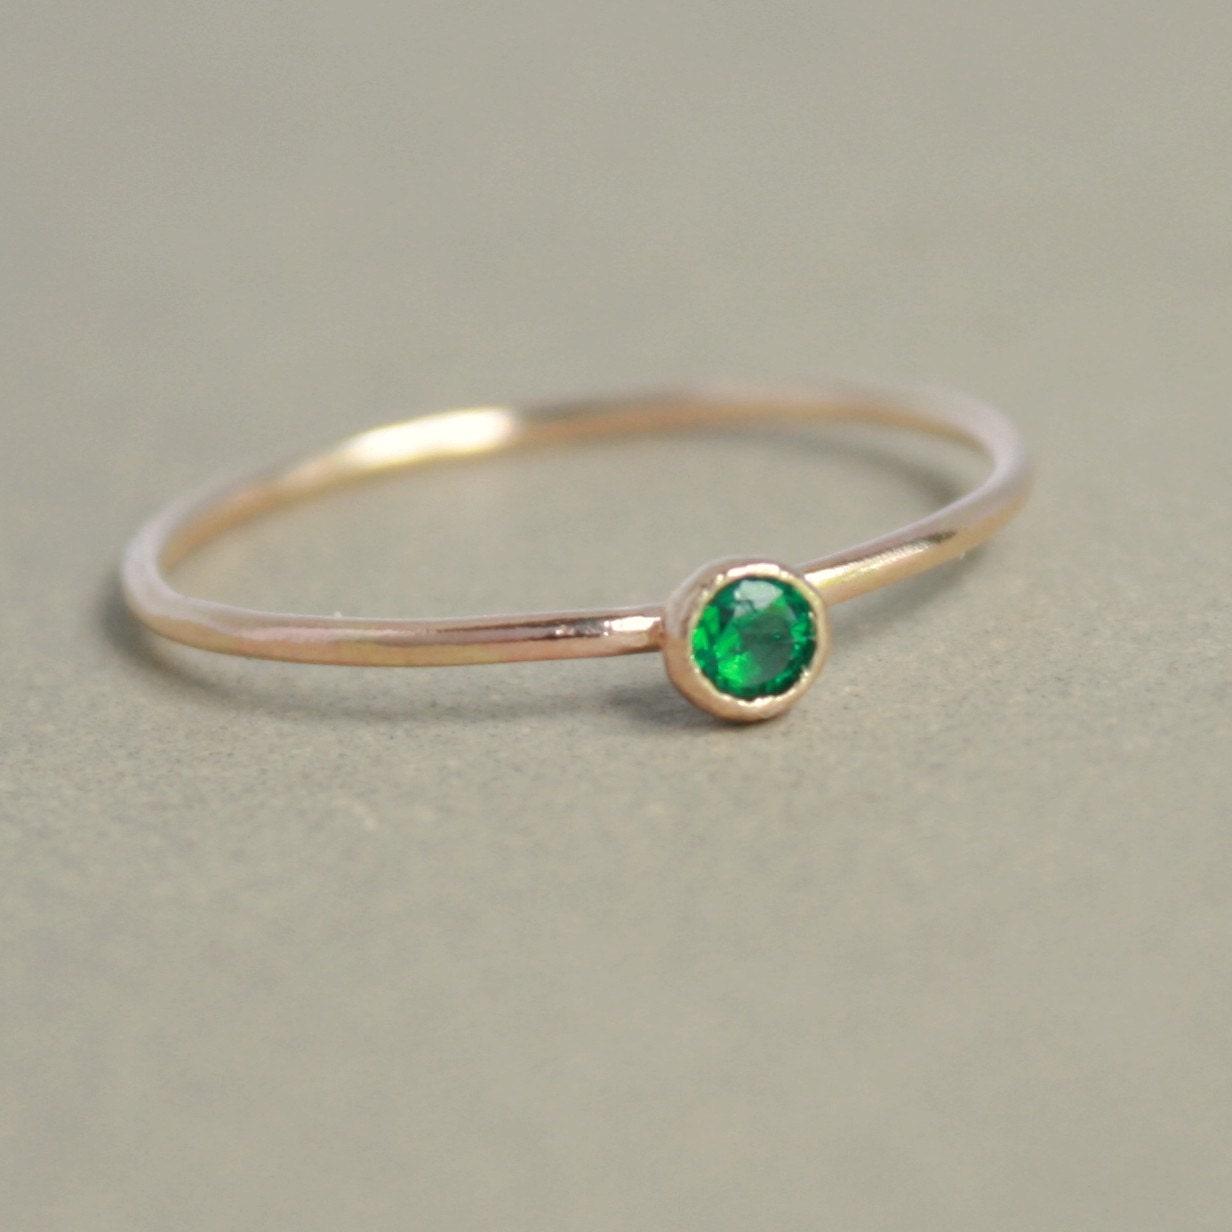 Emerald ring 14k